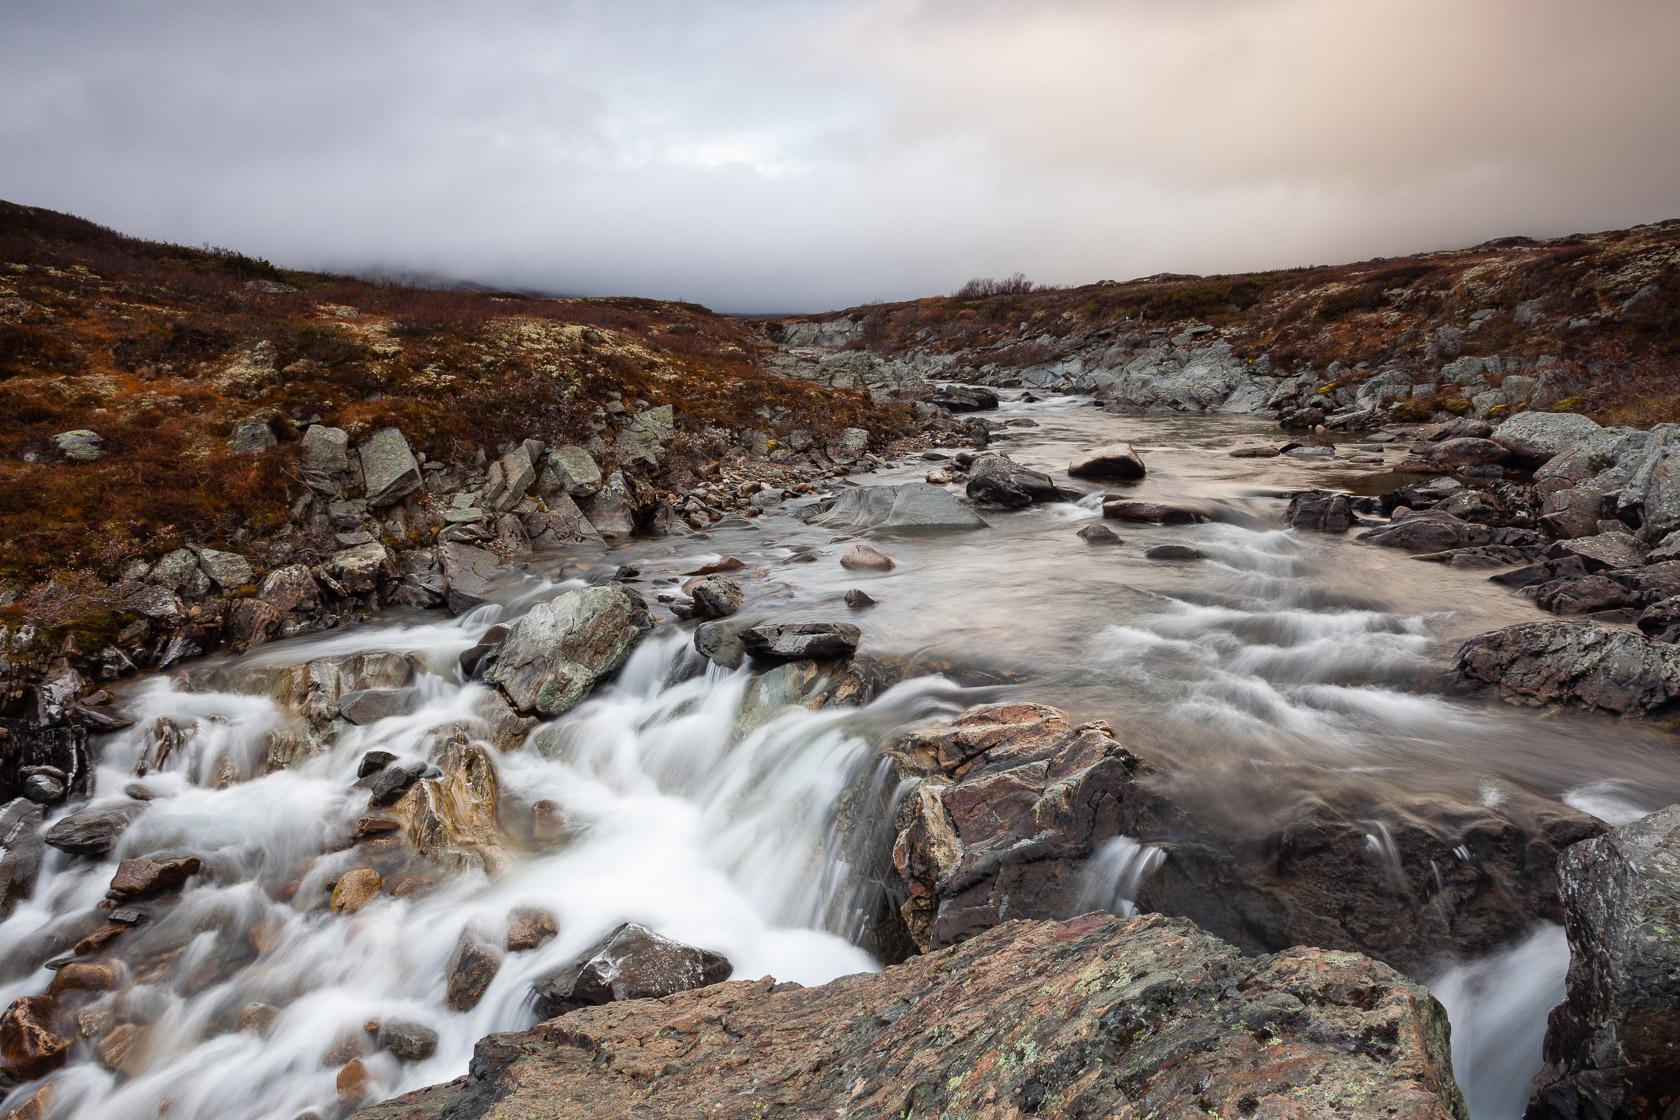 rivière Kaldvela, dans le Dovrefjell